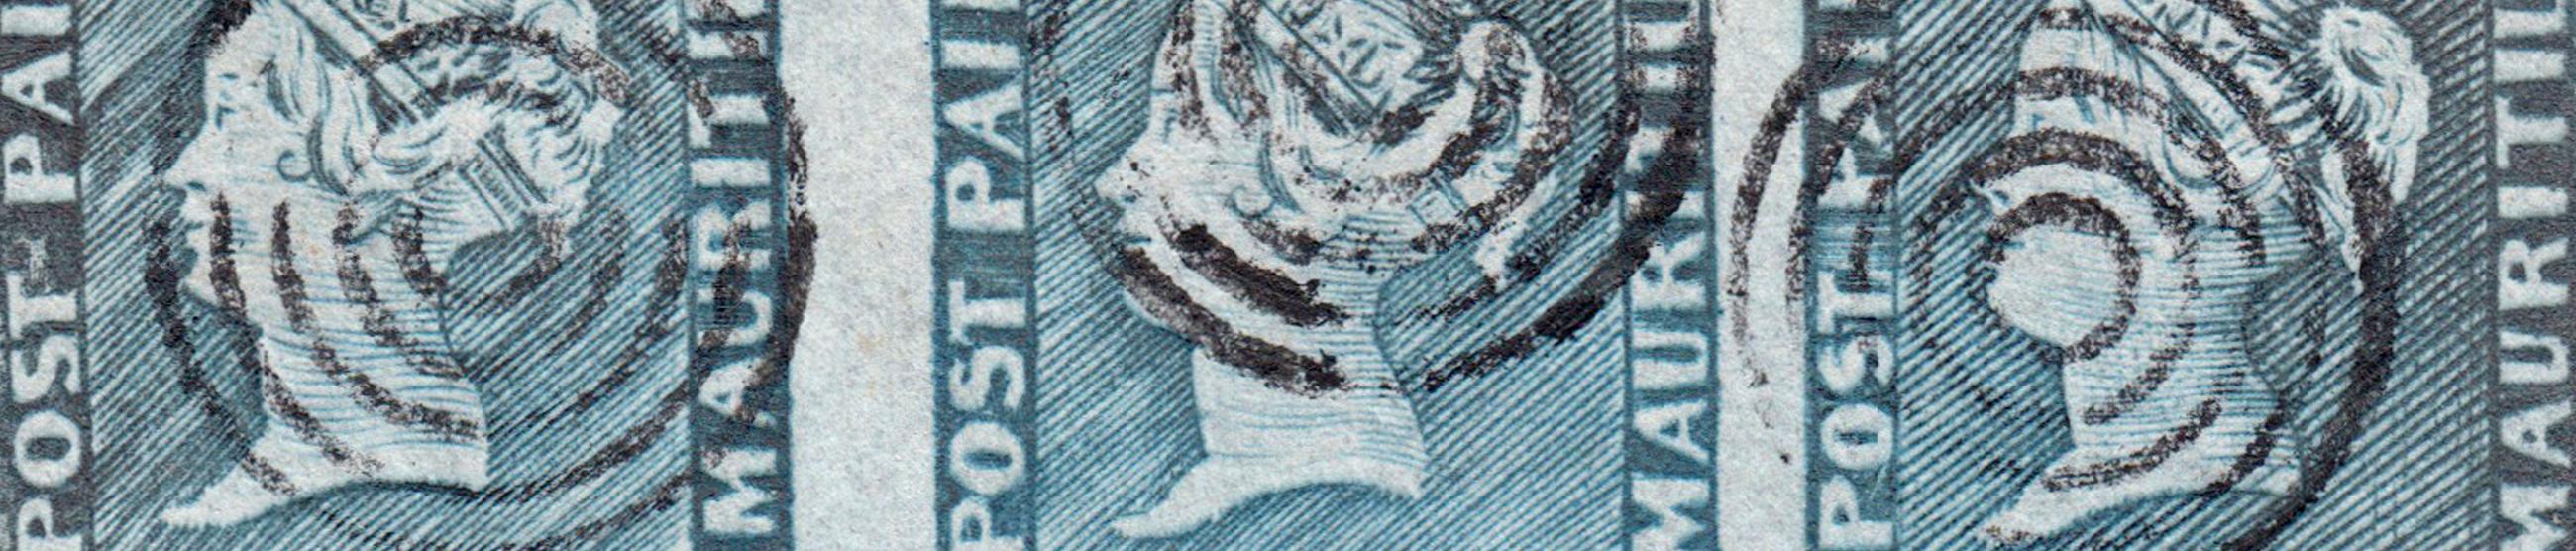 Mauritius stamps private treaty 2015 David Feldman